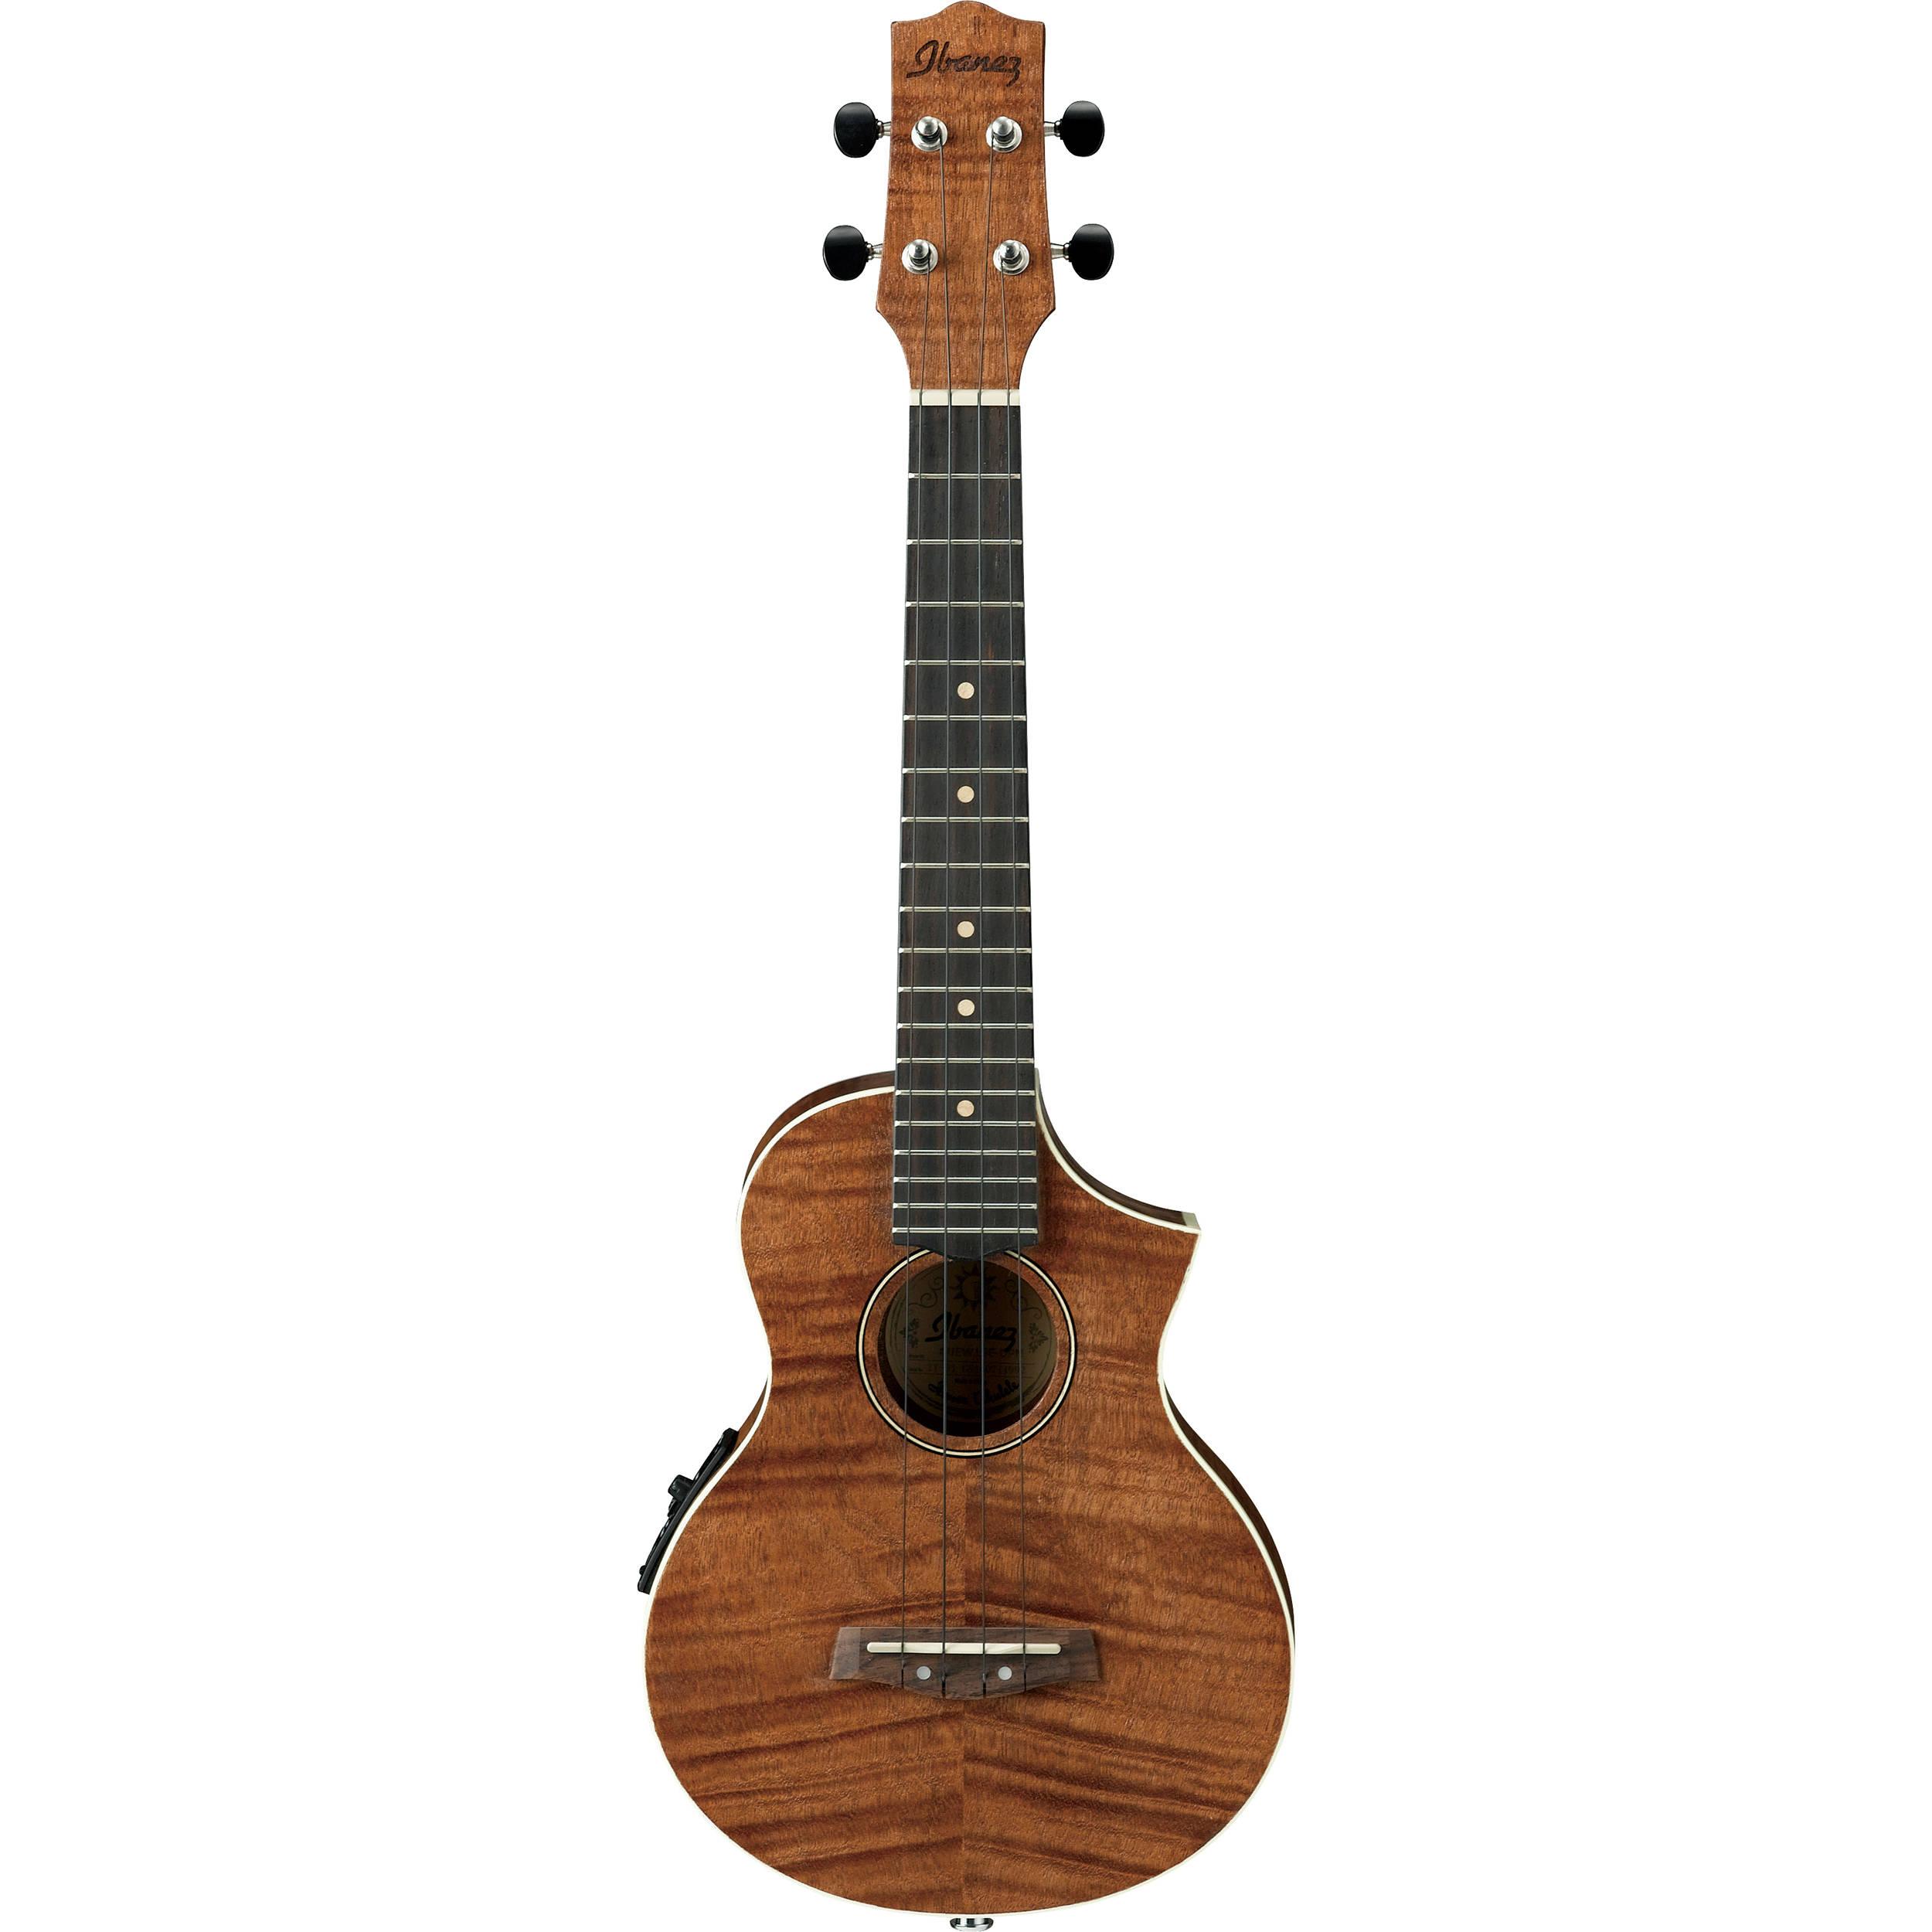 ibanez uew15e acoustic electric concert ukulele uew15e b h photo. Black Bedroom Furniture Sets. Home Design Ideas